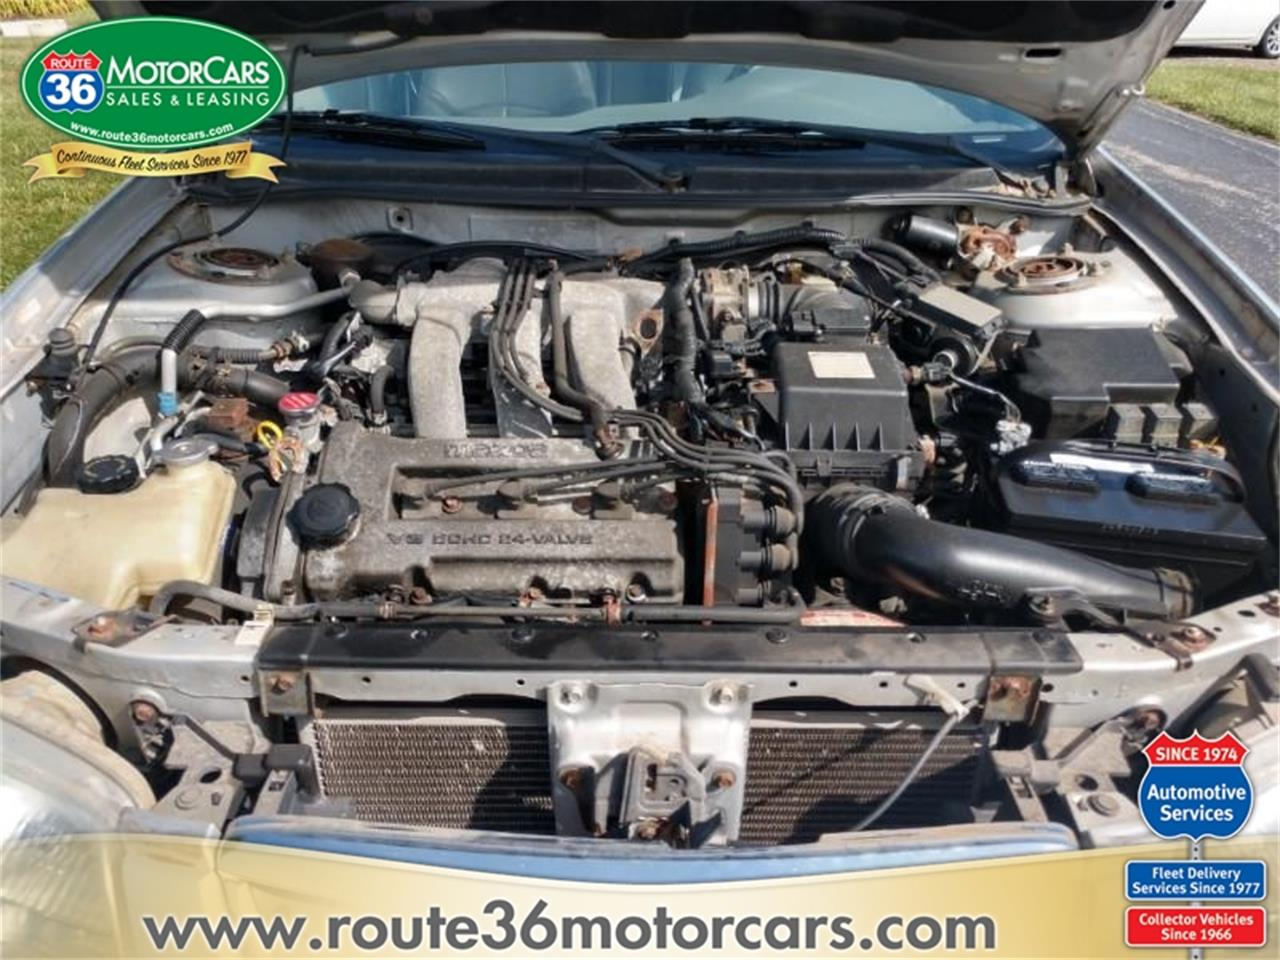 2001 mazda 626 for sale classiccars com cc 1383924 classic cars